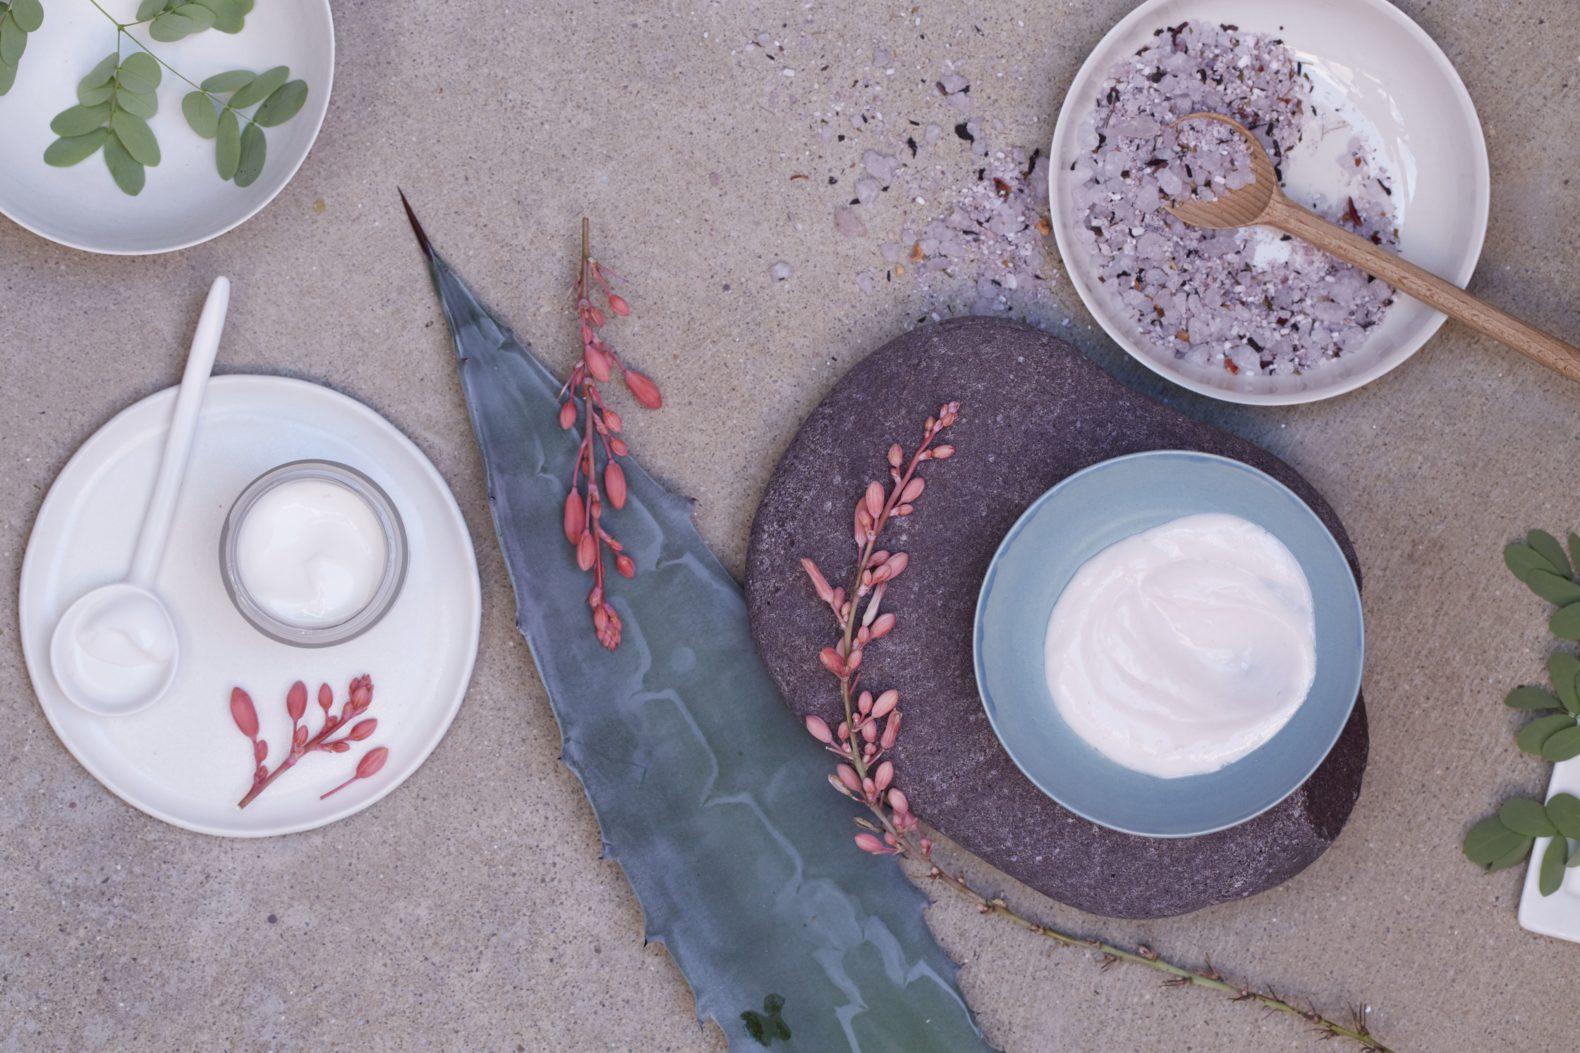 products-herbs-massage-canyon-ranch-wellness-resort-arizona-usa